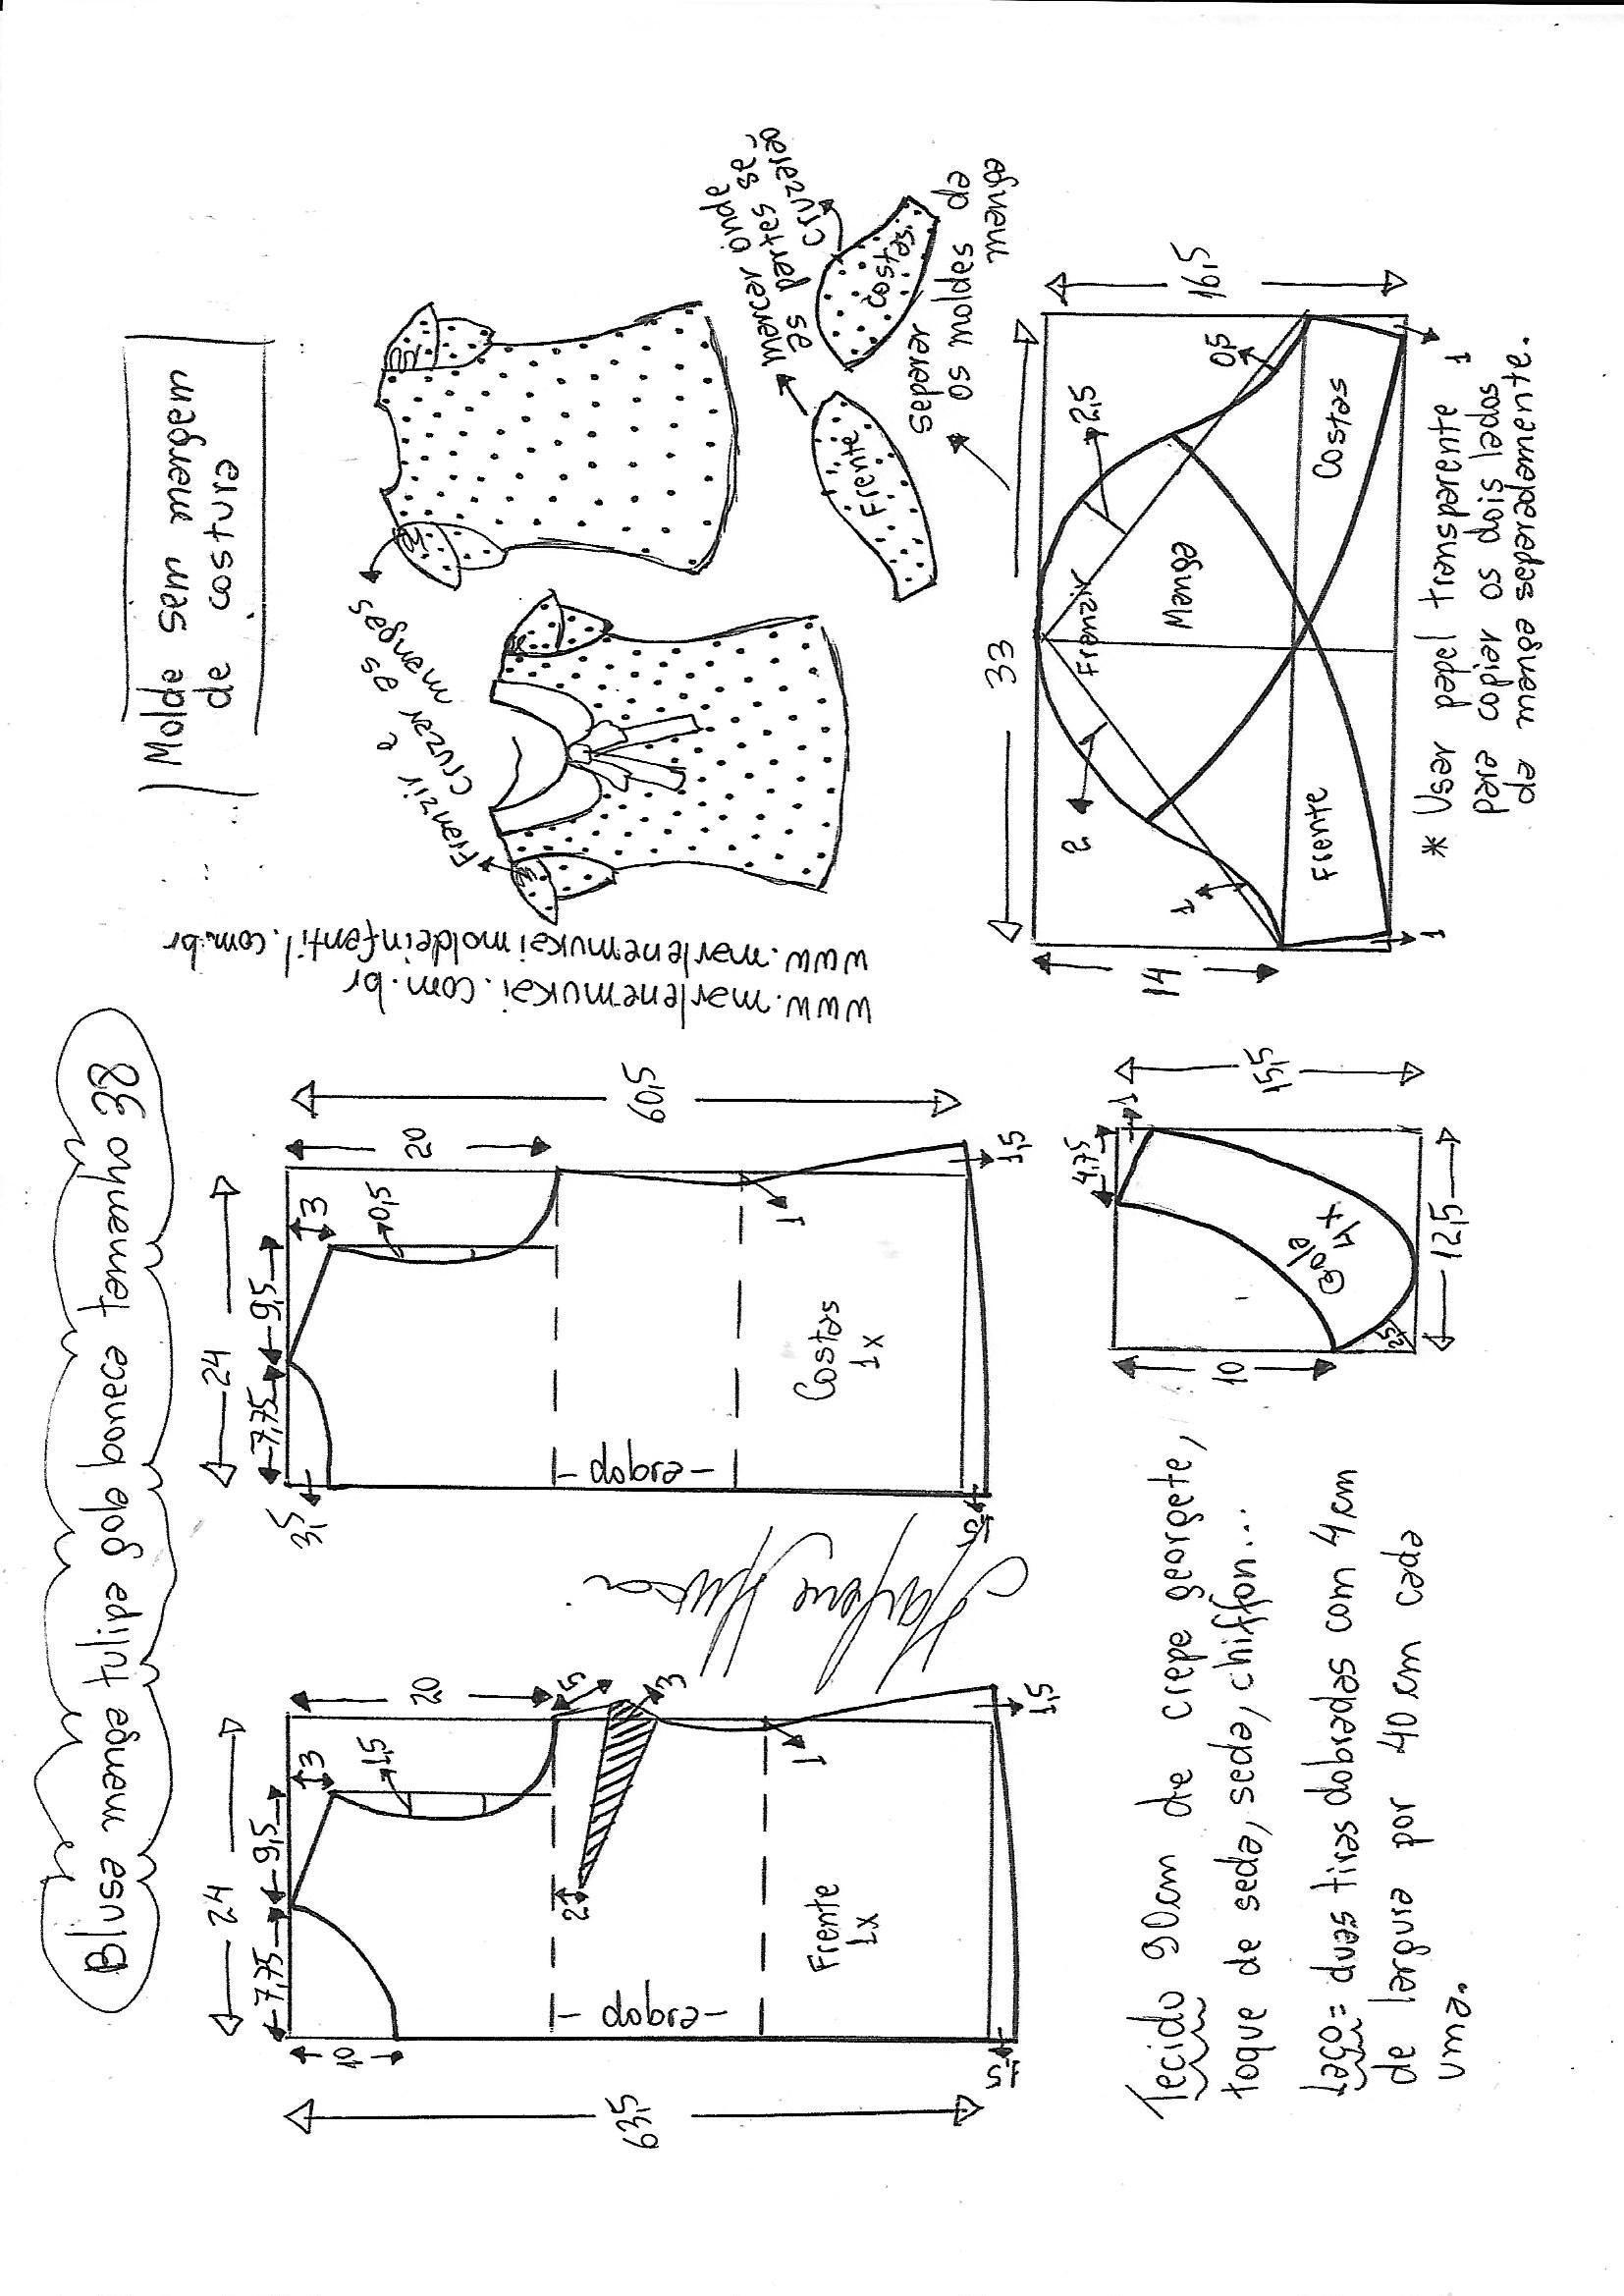 Pin de bety en patrones | Sewing, Sewing patterns y Sewing patterns free